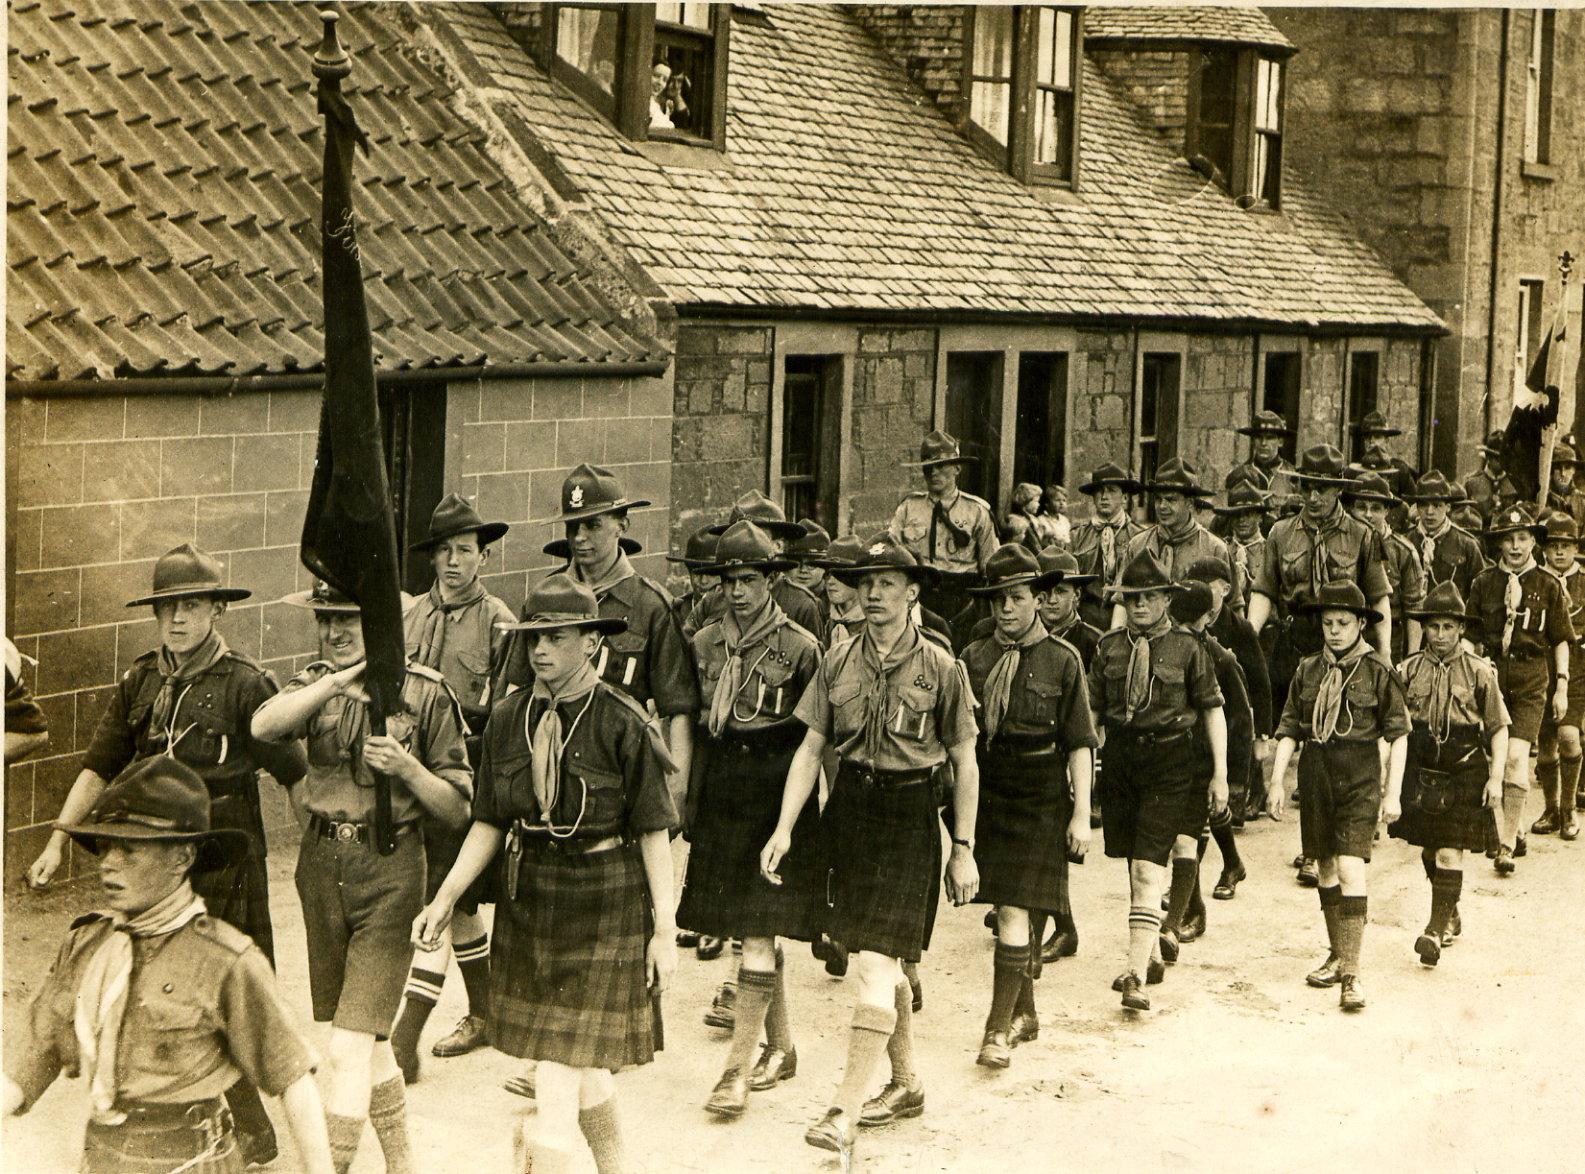 File:Boy Scout Parade Scotland jpg - Wikimedia Commons